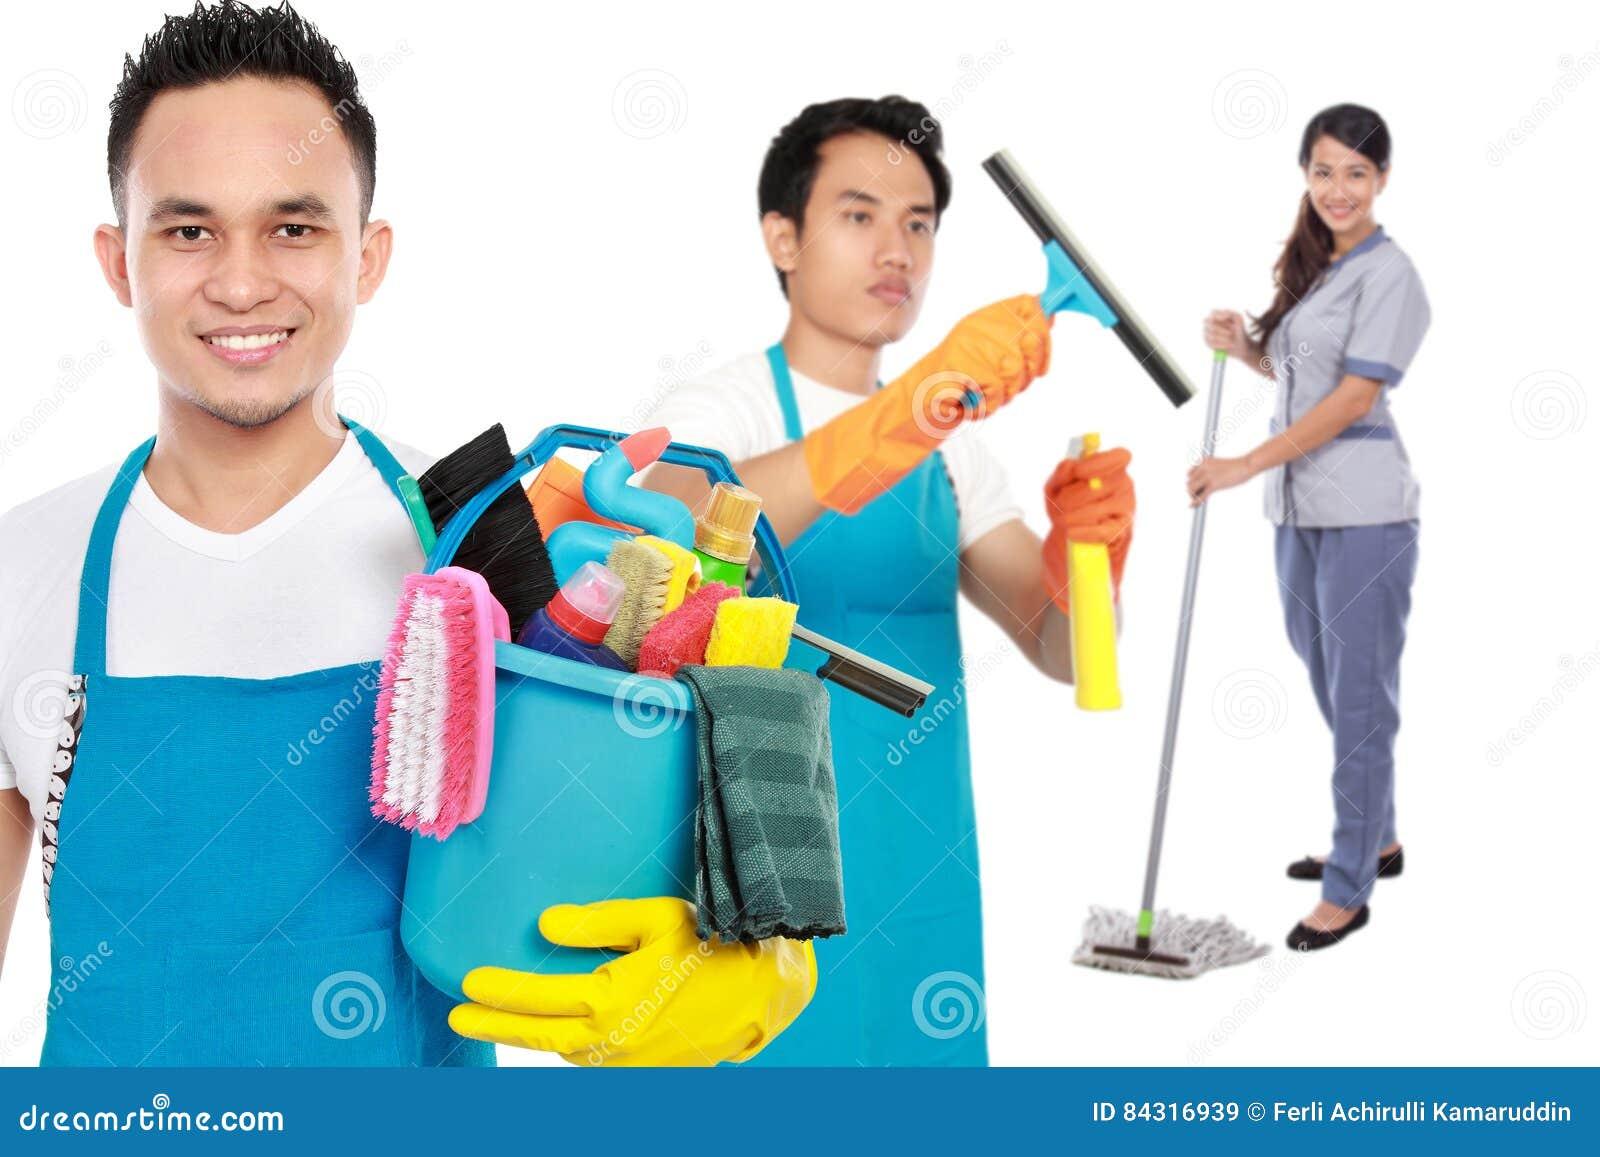 Grupo de serviços da limpeza prontos para fazer as tarefas